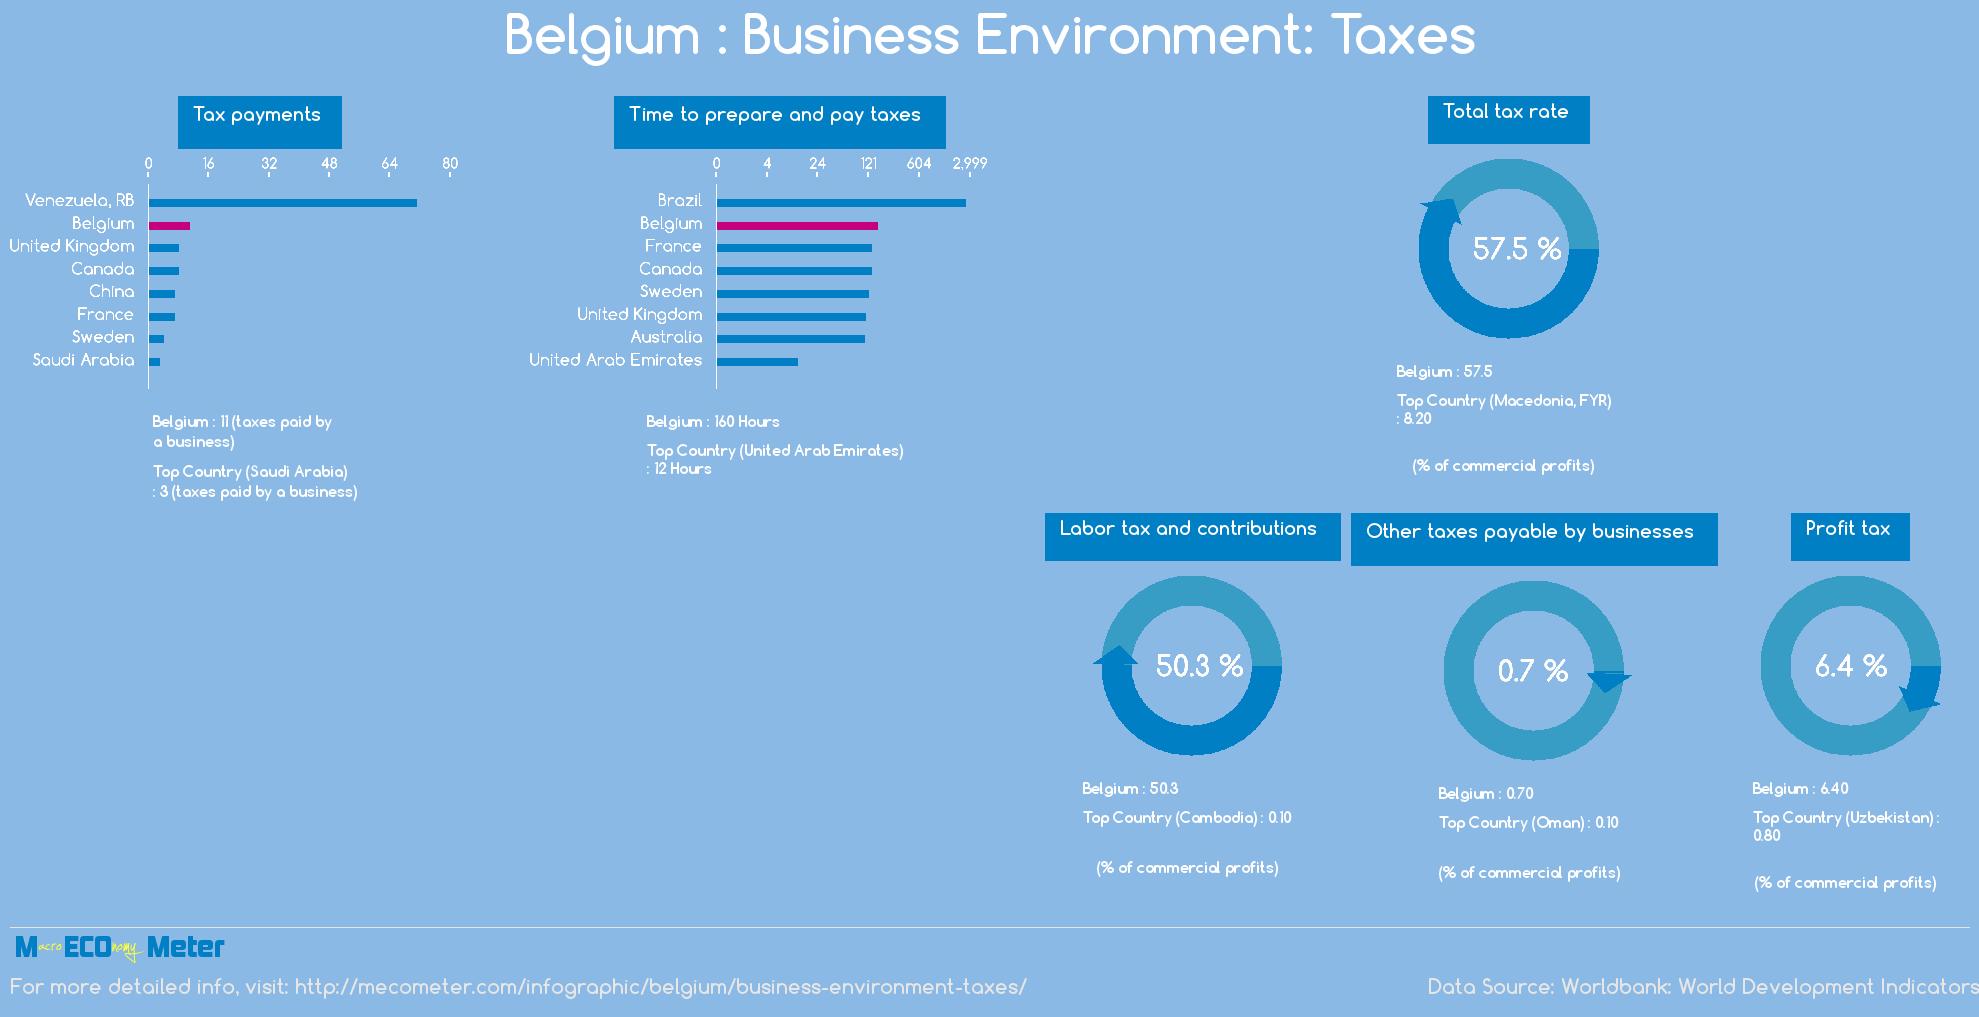 Belgium : Business Environment: Taxes